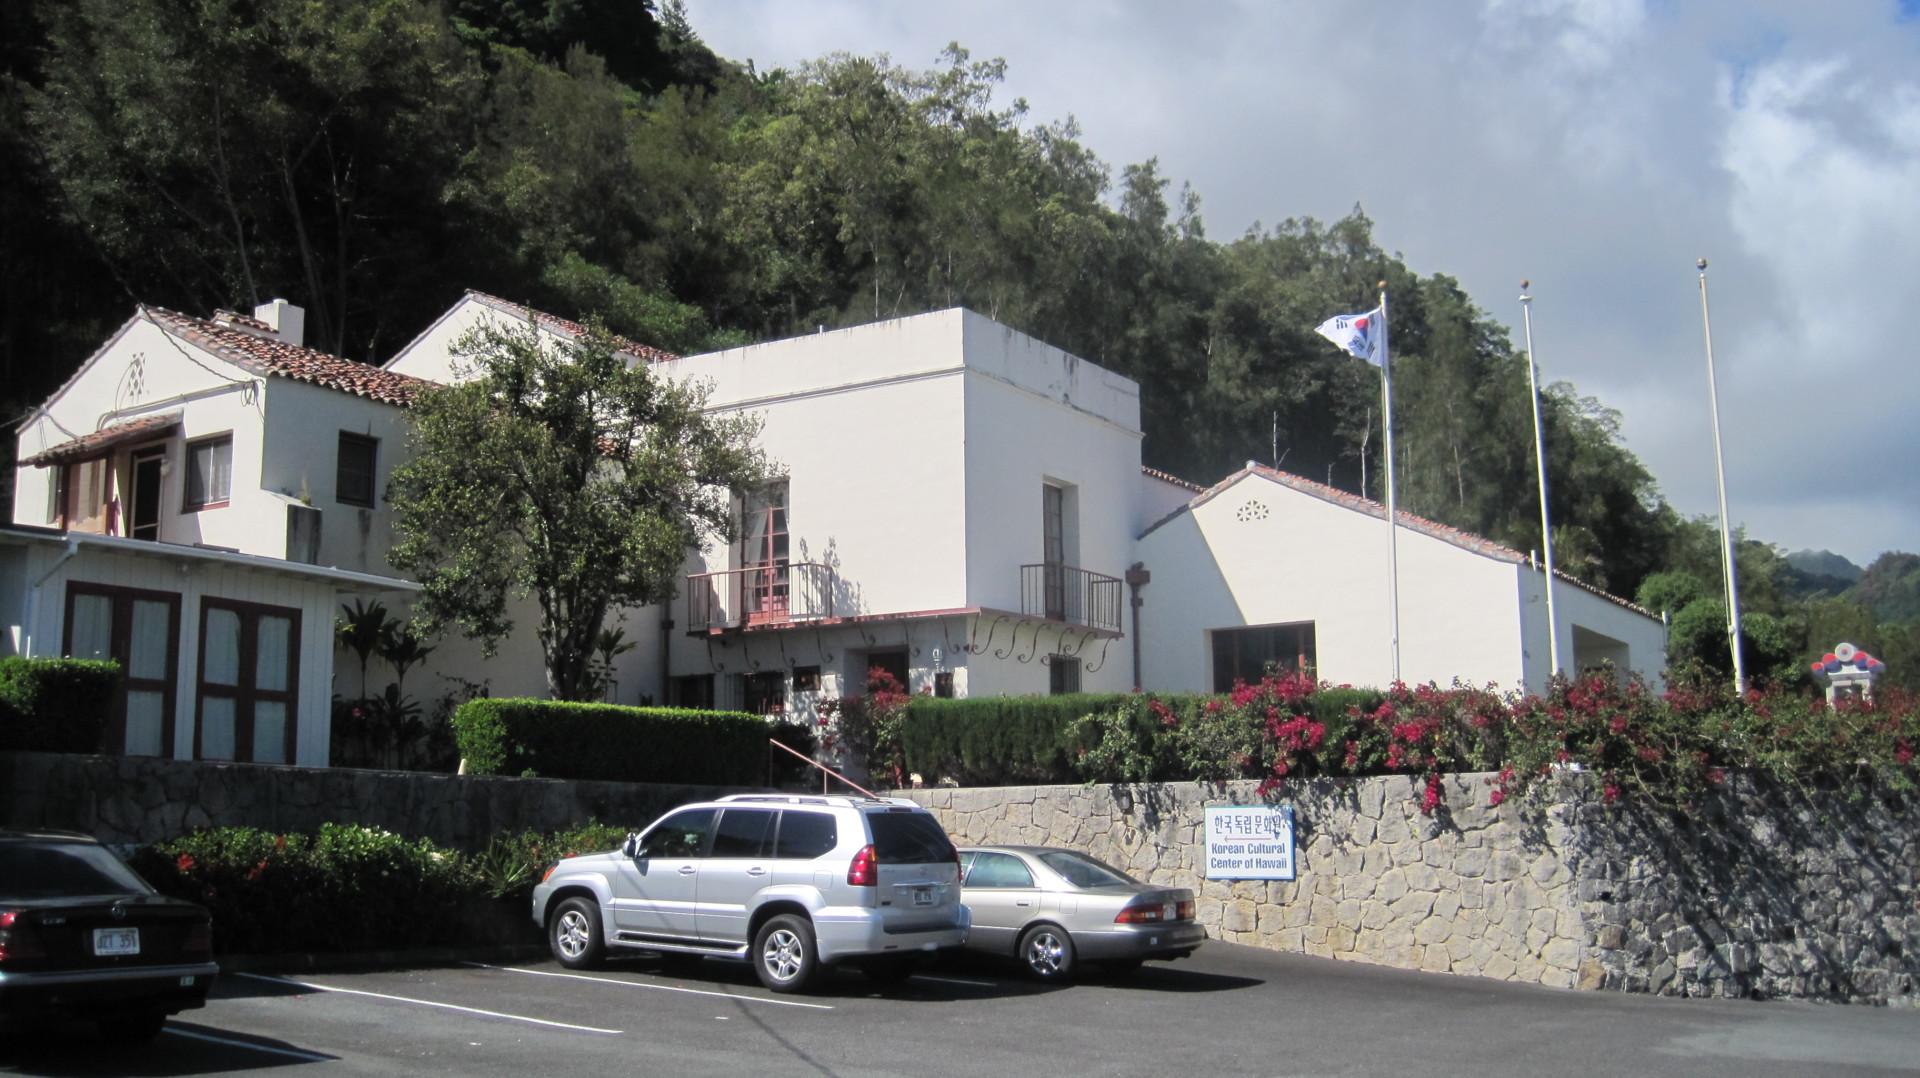 2756 Rooke Avenue/ George de S. Canavarro House